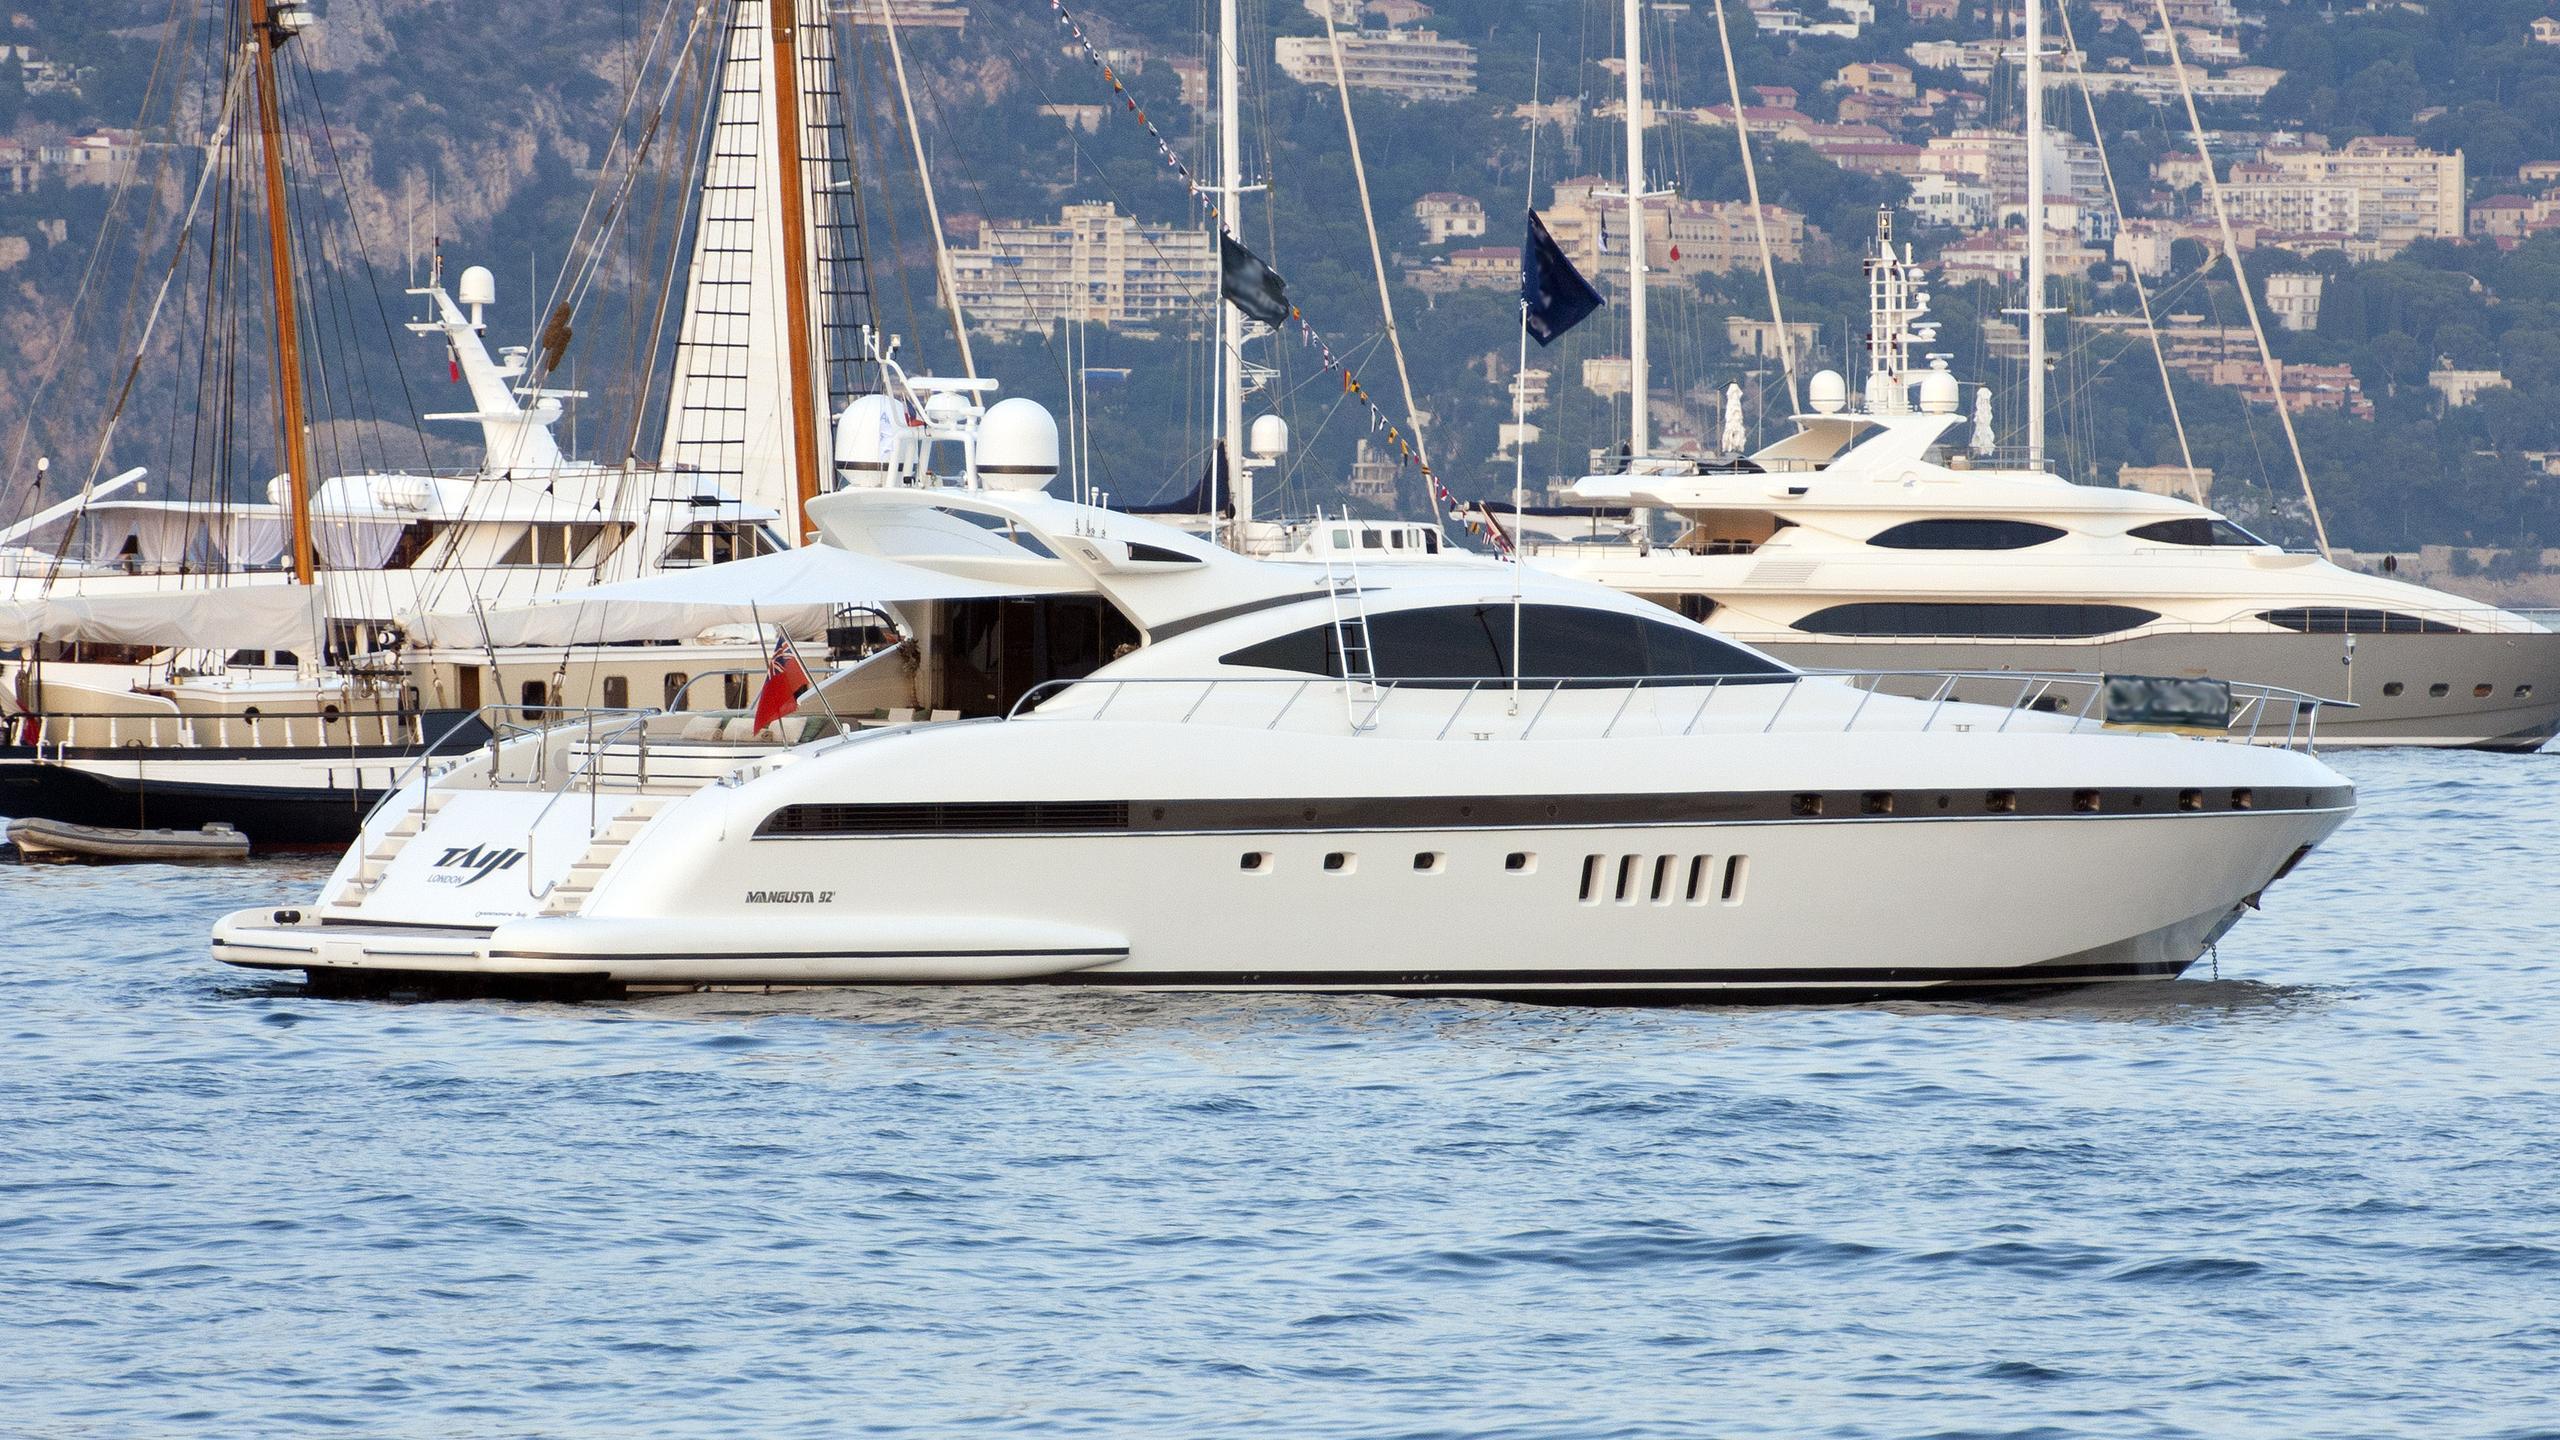 taiji-motor-yacht-overmarine-Mangusta-92-Open-Ht-2006-28m-profile